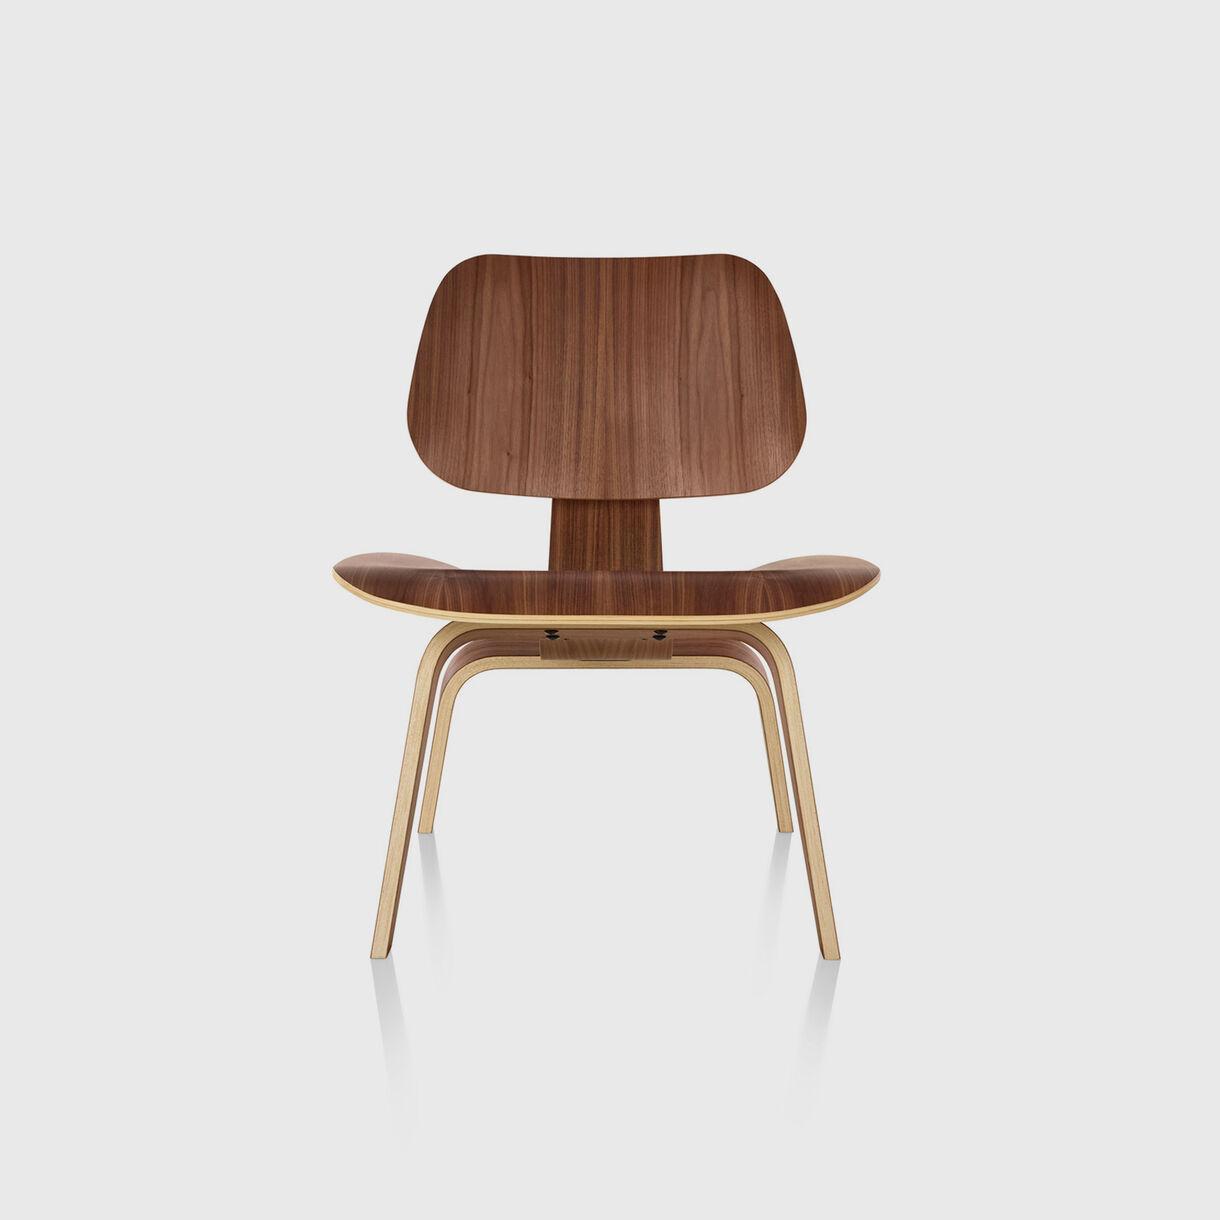 Eames Moulded Plywood Lounge Chair, Wood Base, Santos Palisander